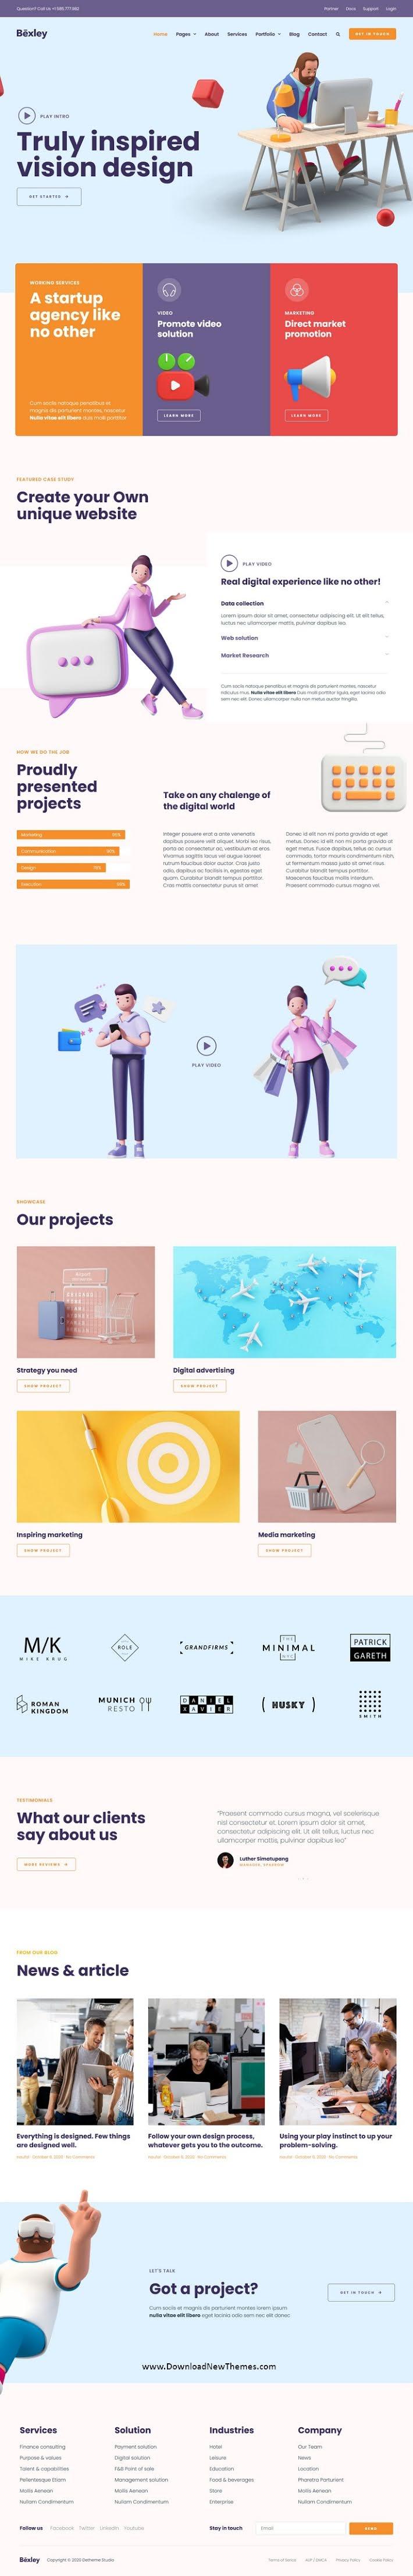 Digital Marketing Agency Template Kit